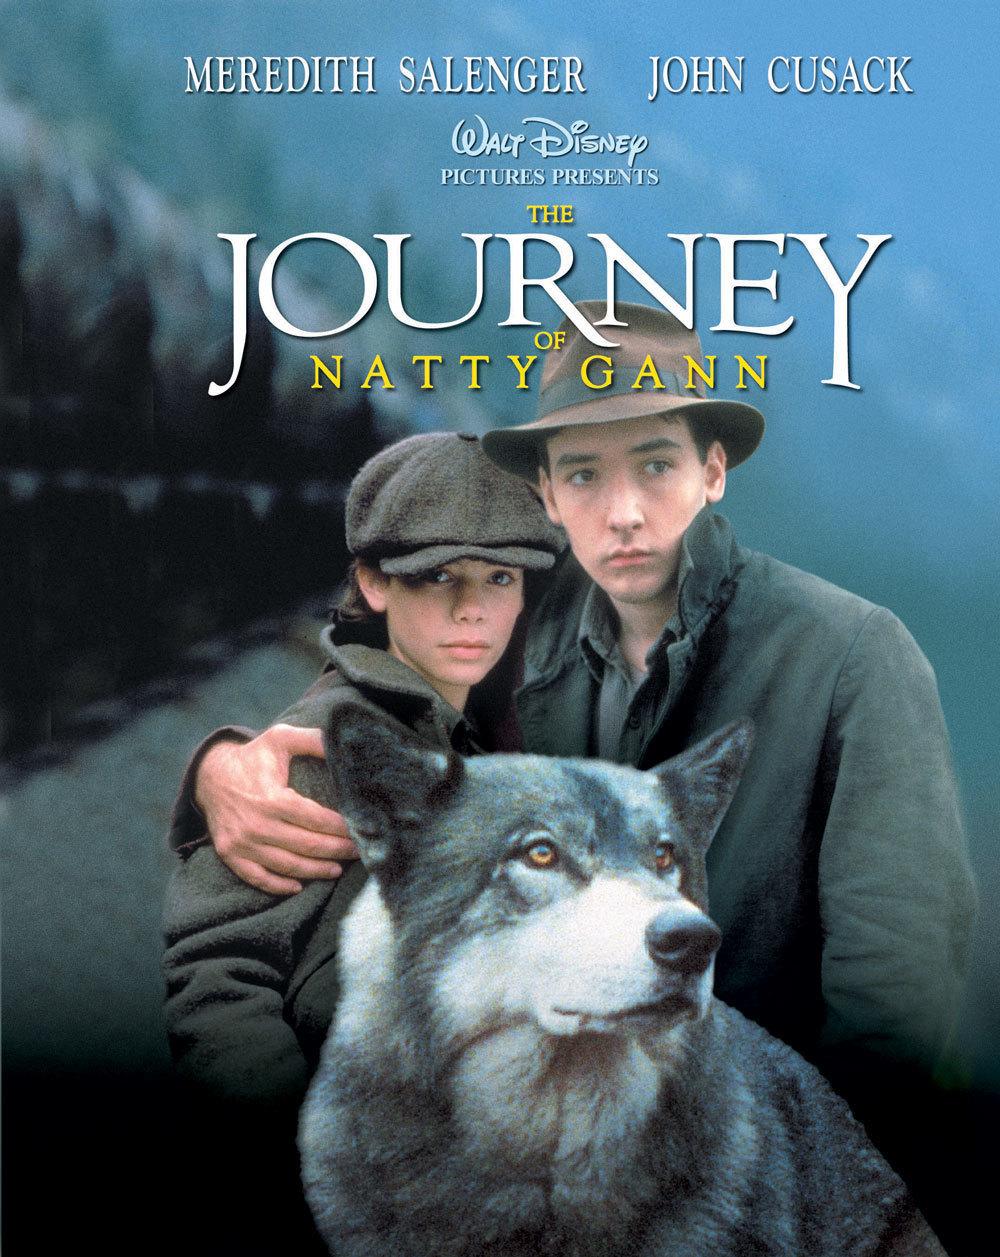 the journey of natty gann full movie